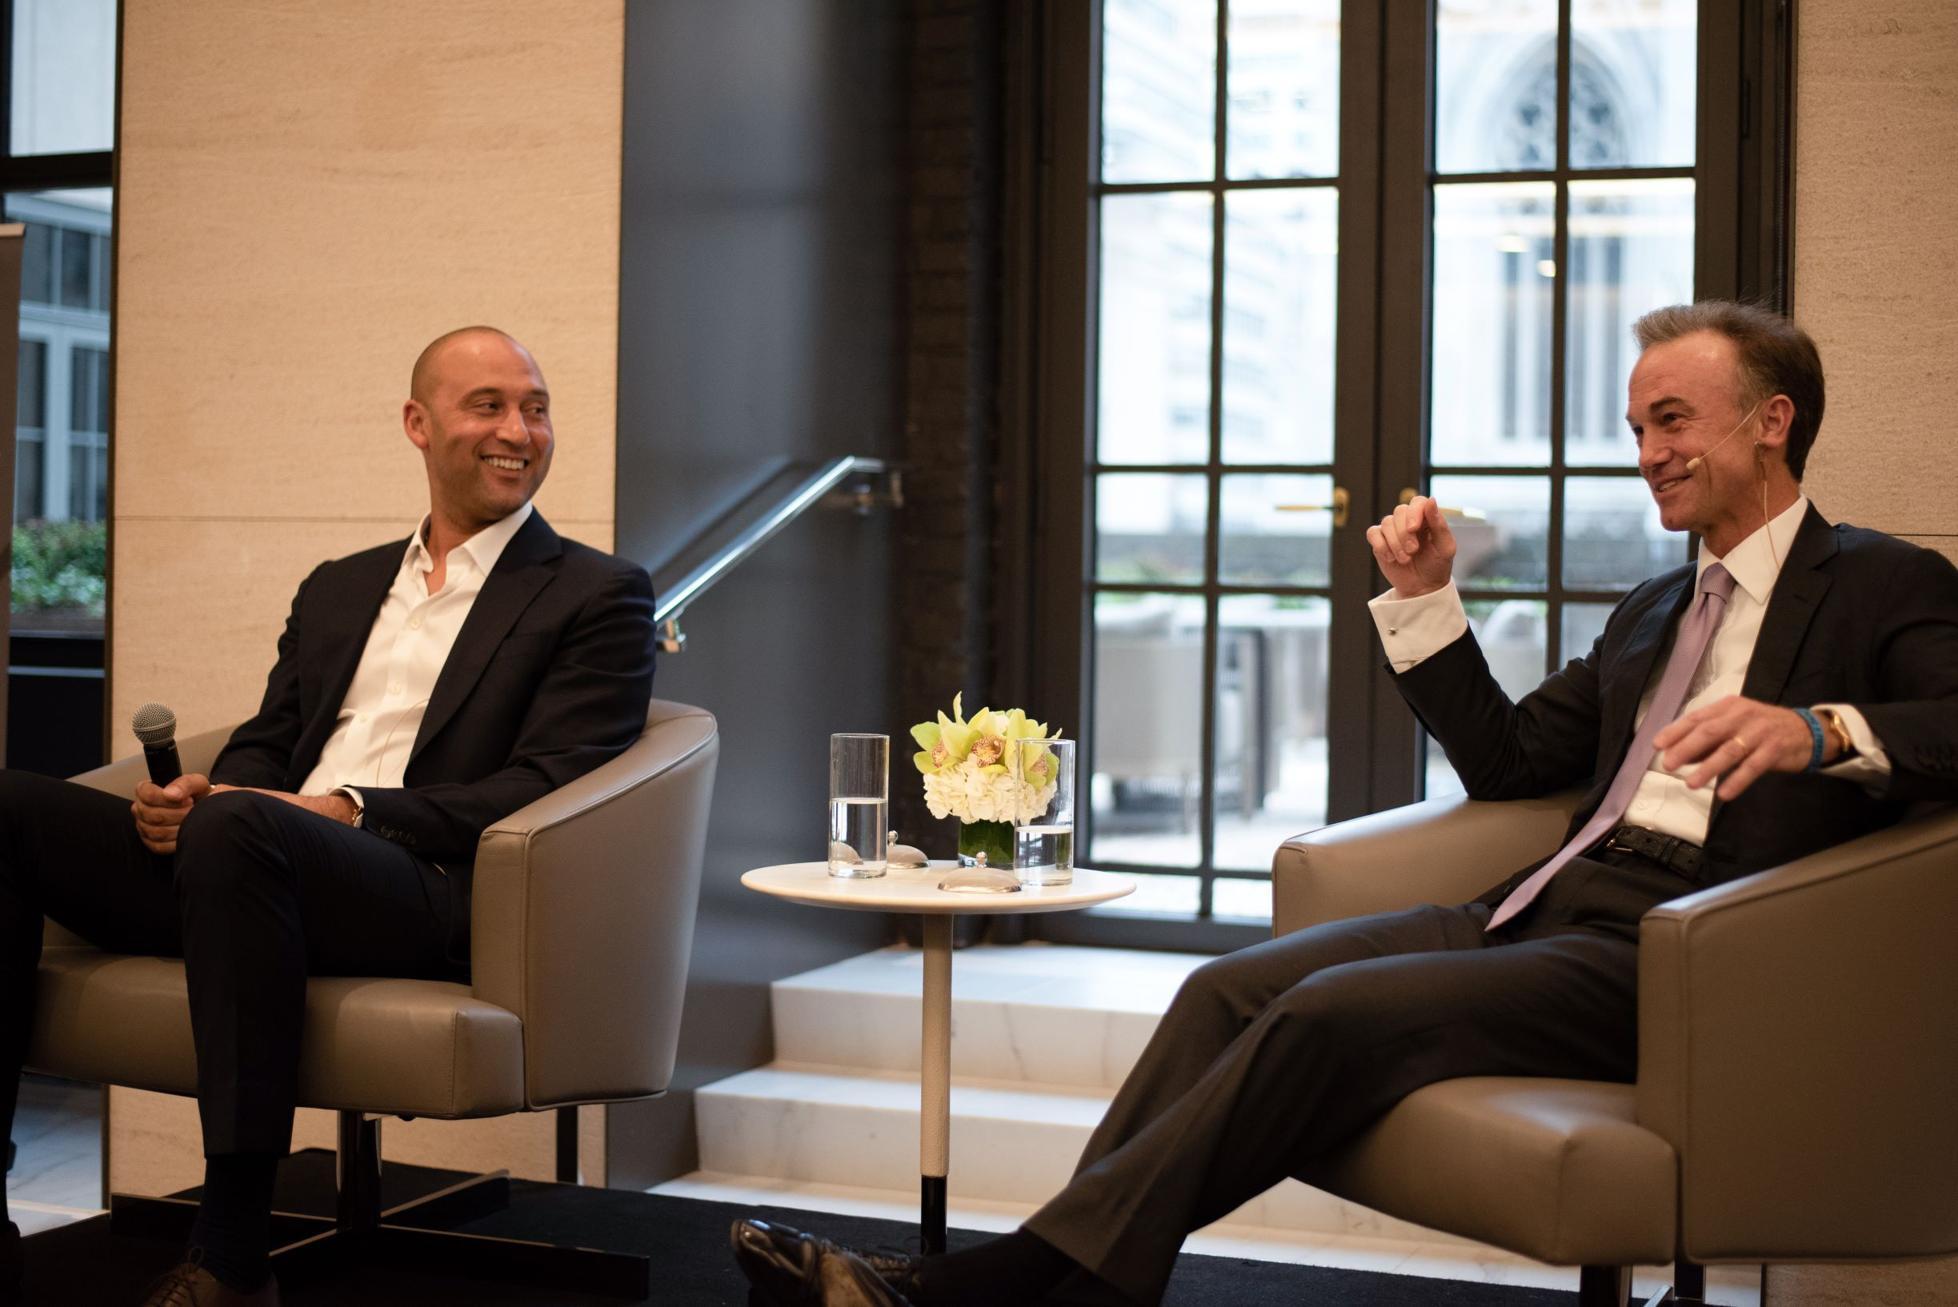 Derek Jeter and Greg Fleming pictured at a 2019 client event at Rockefeller's headquarters in Rockefeller Plaza.